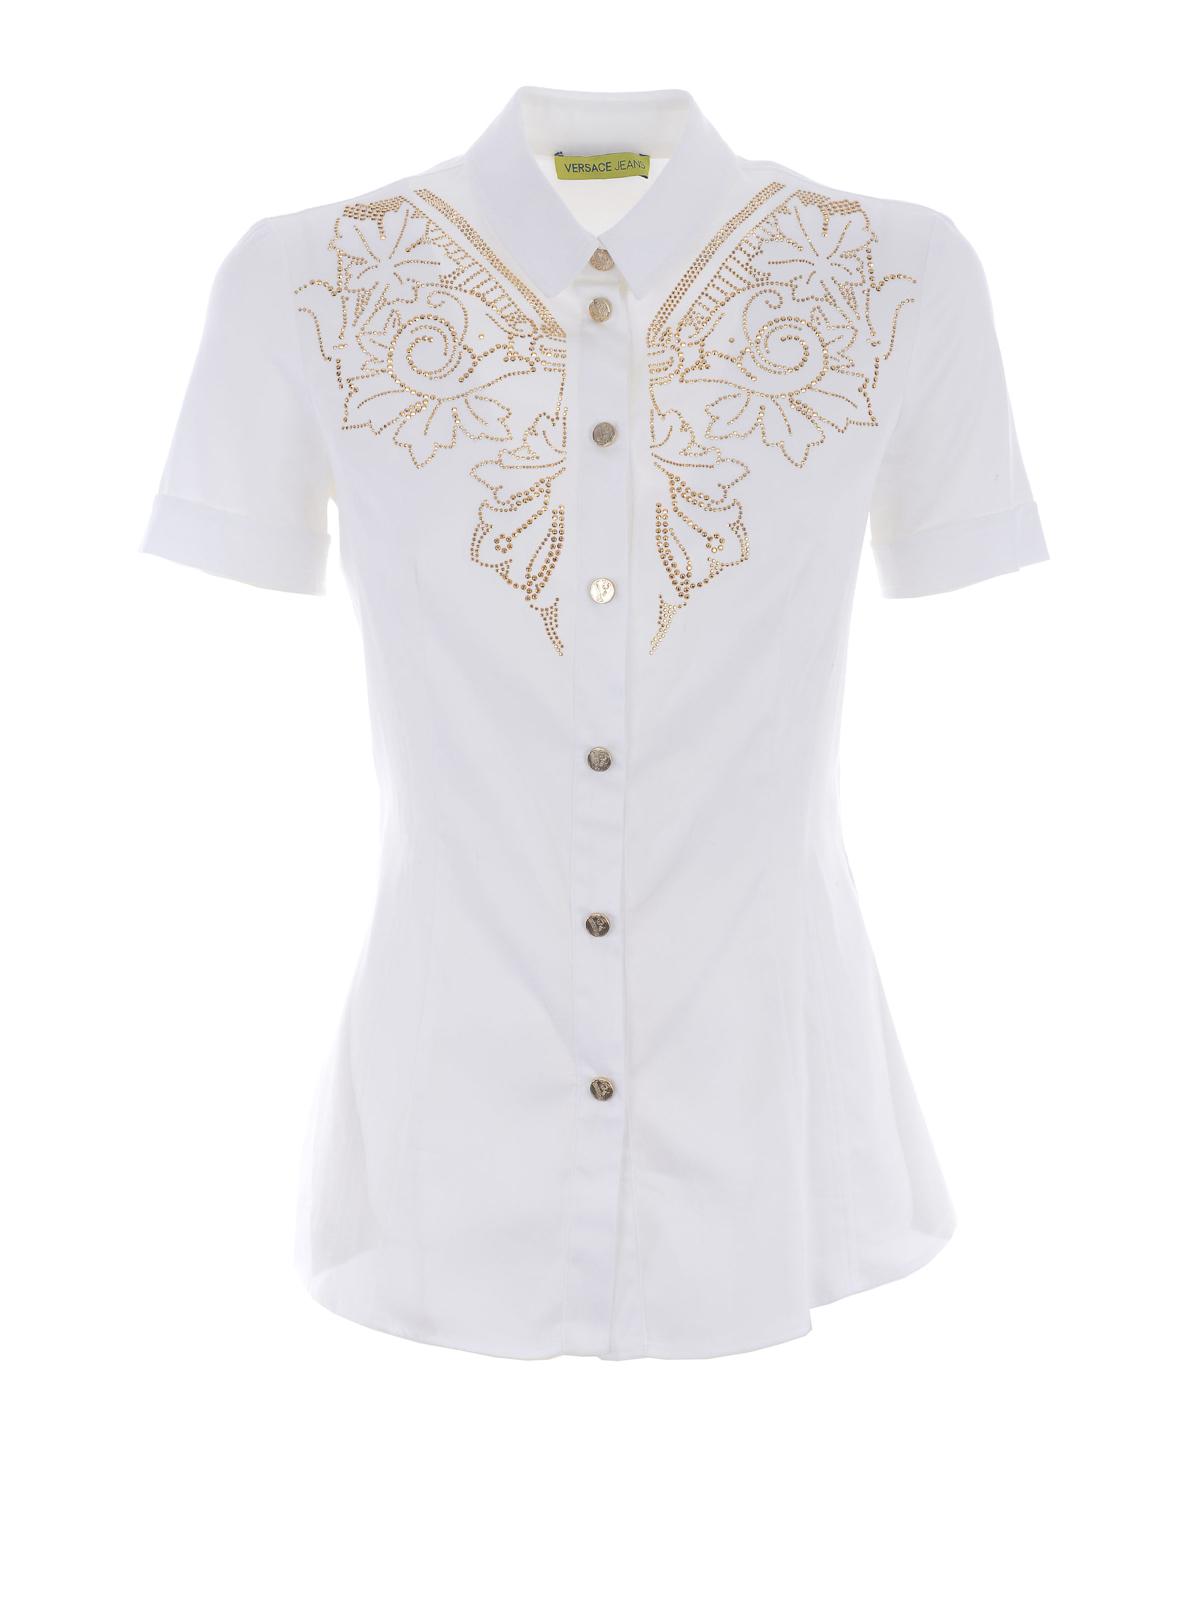 Versace jeans cotton poplin shirt by versace shirts ikrix for What is a poplin shirt